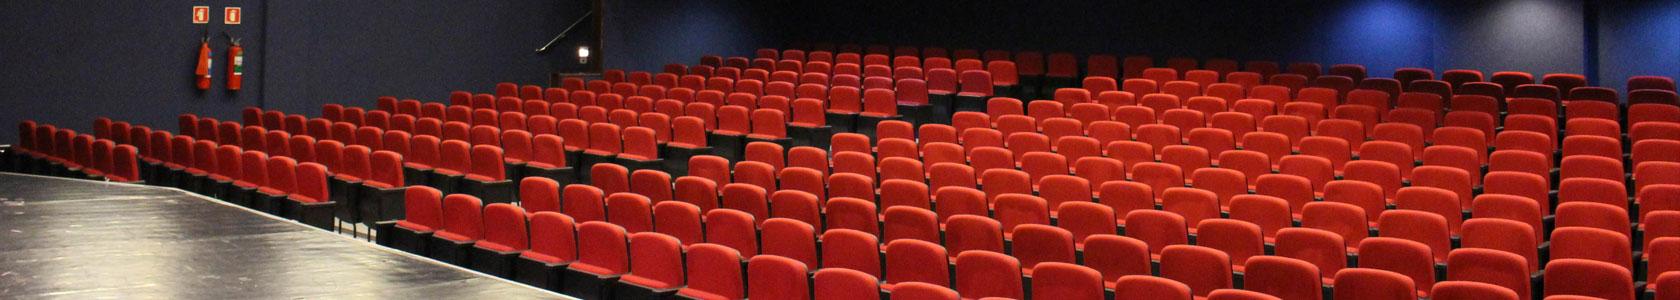 banner - teatro